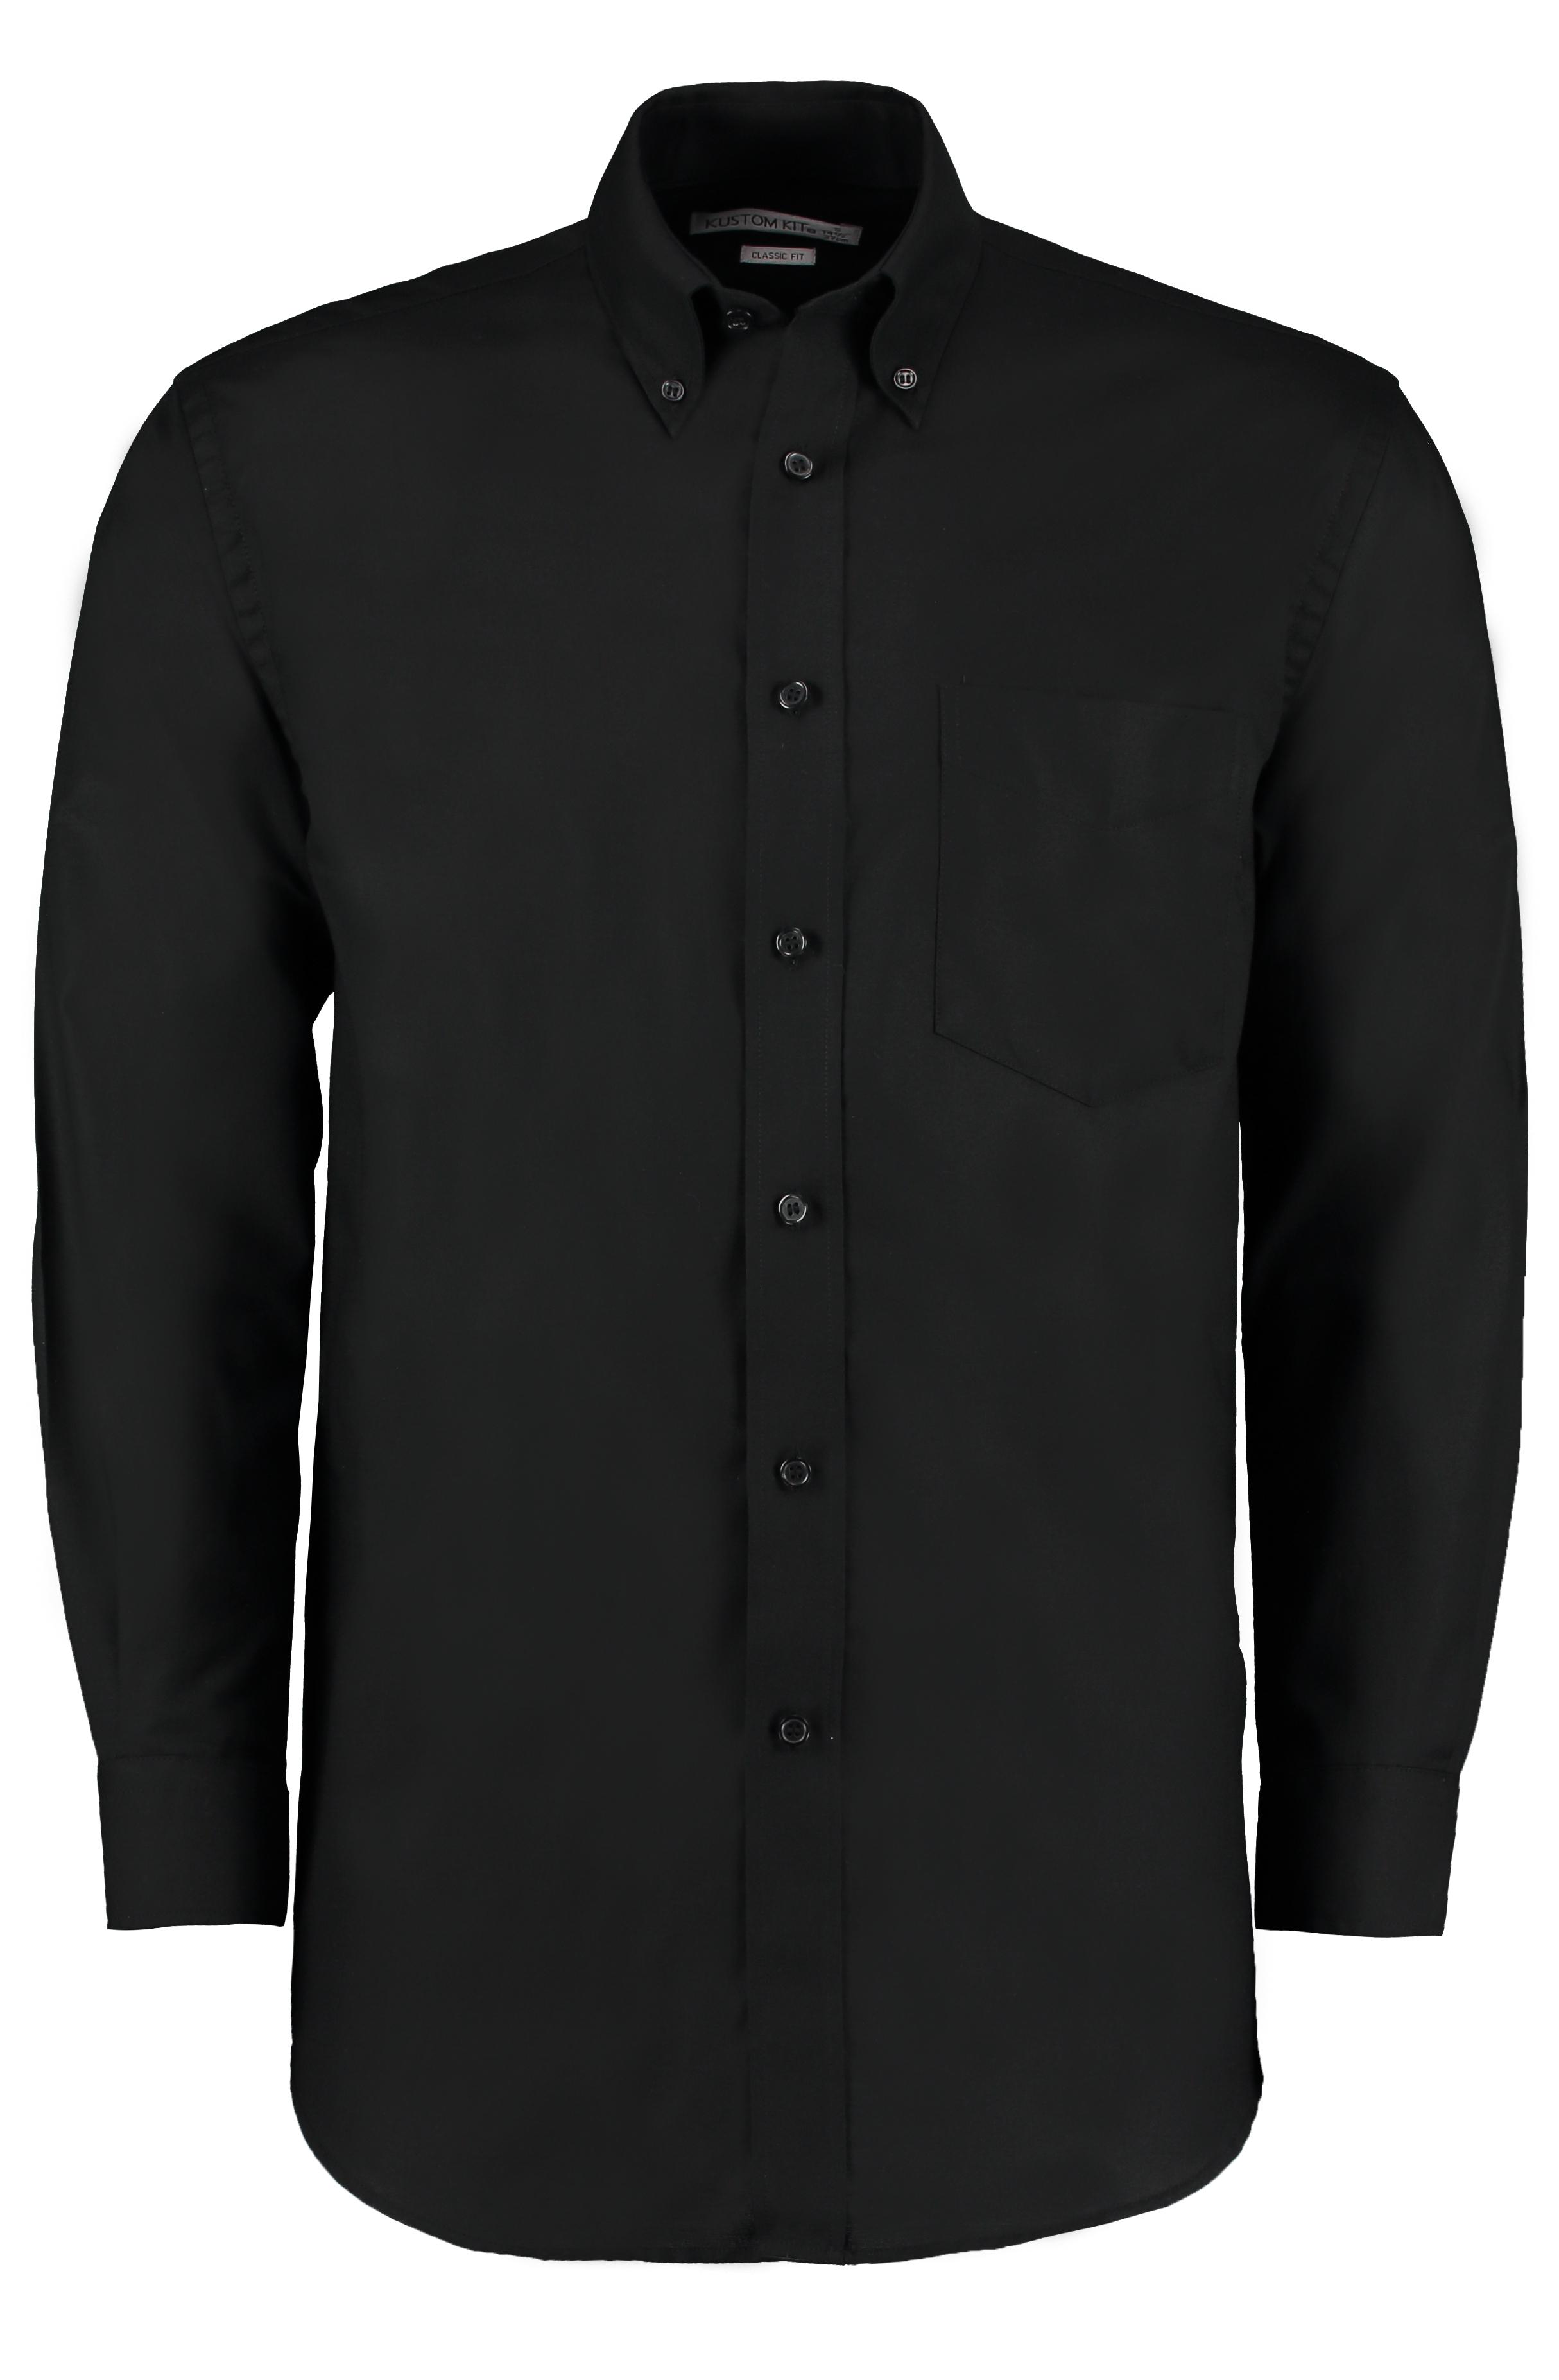 New Mens KUSTOM KIT Polycotton Workplace Oxford Shirt Long Sleeve Size  14.5-23